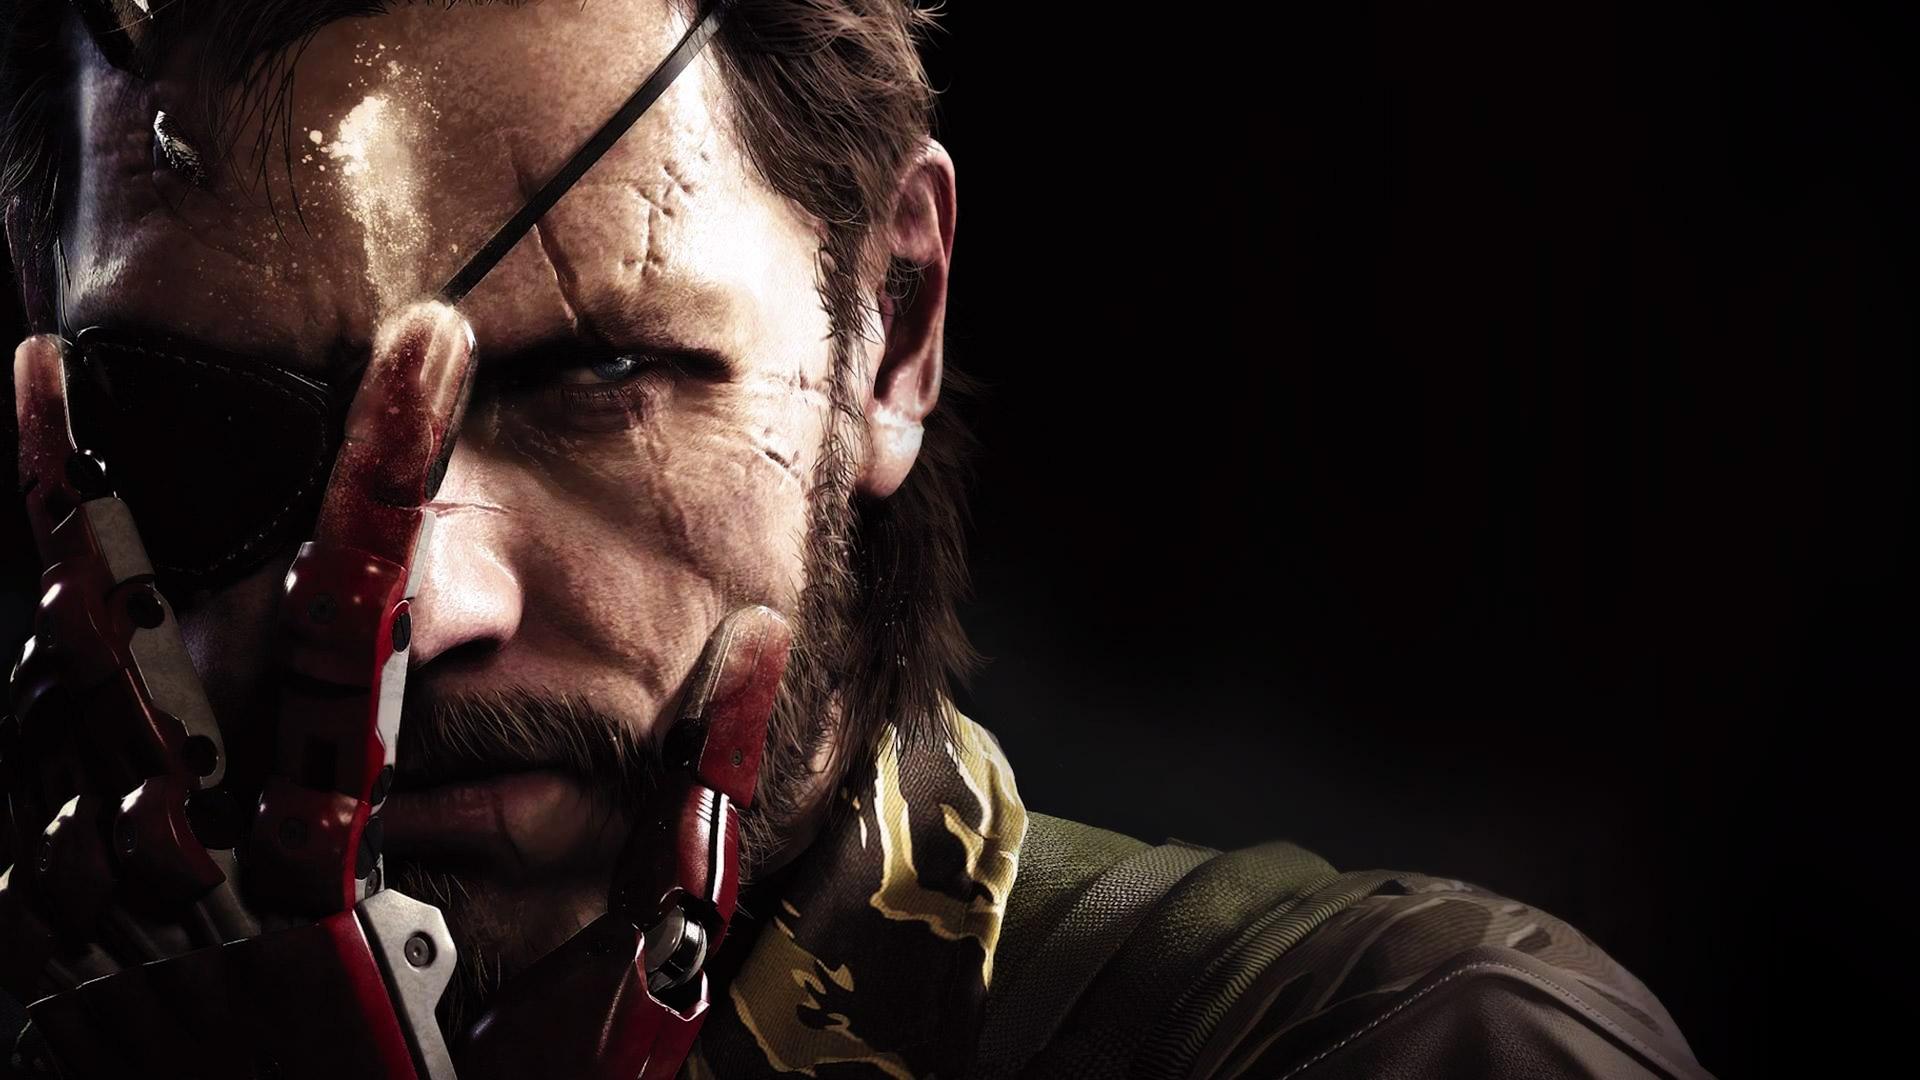 Metal Gear Solid V The Phantom Pain wallpaper 3